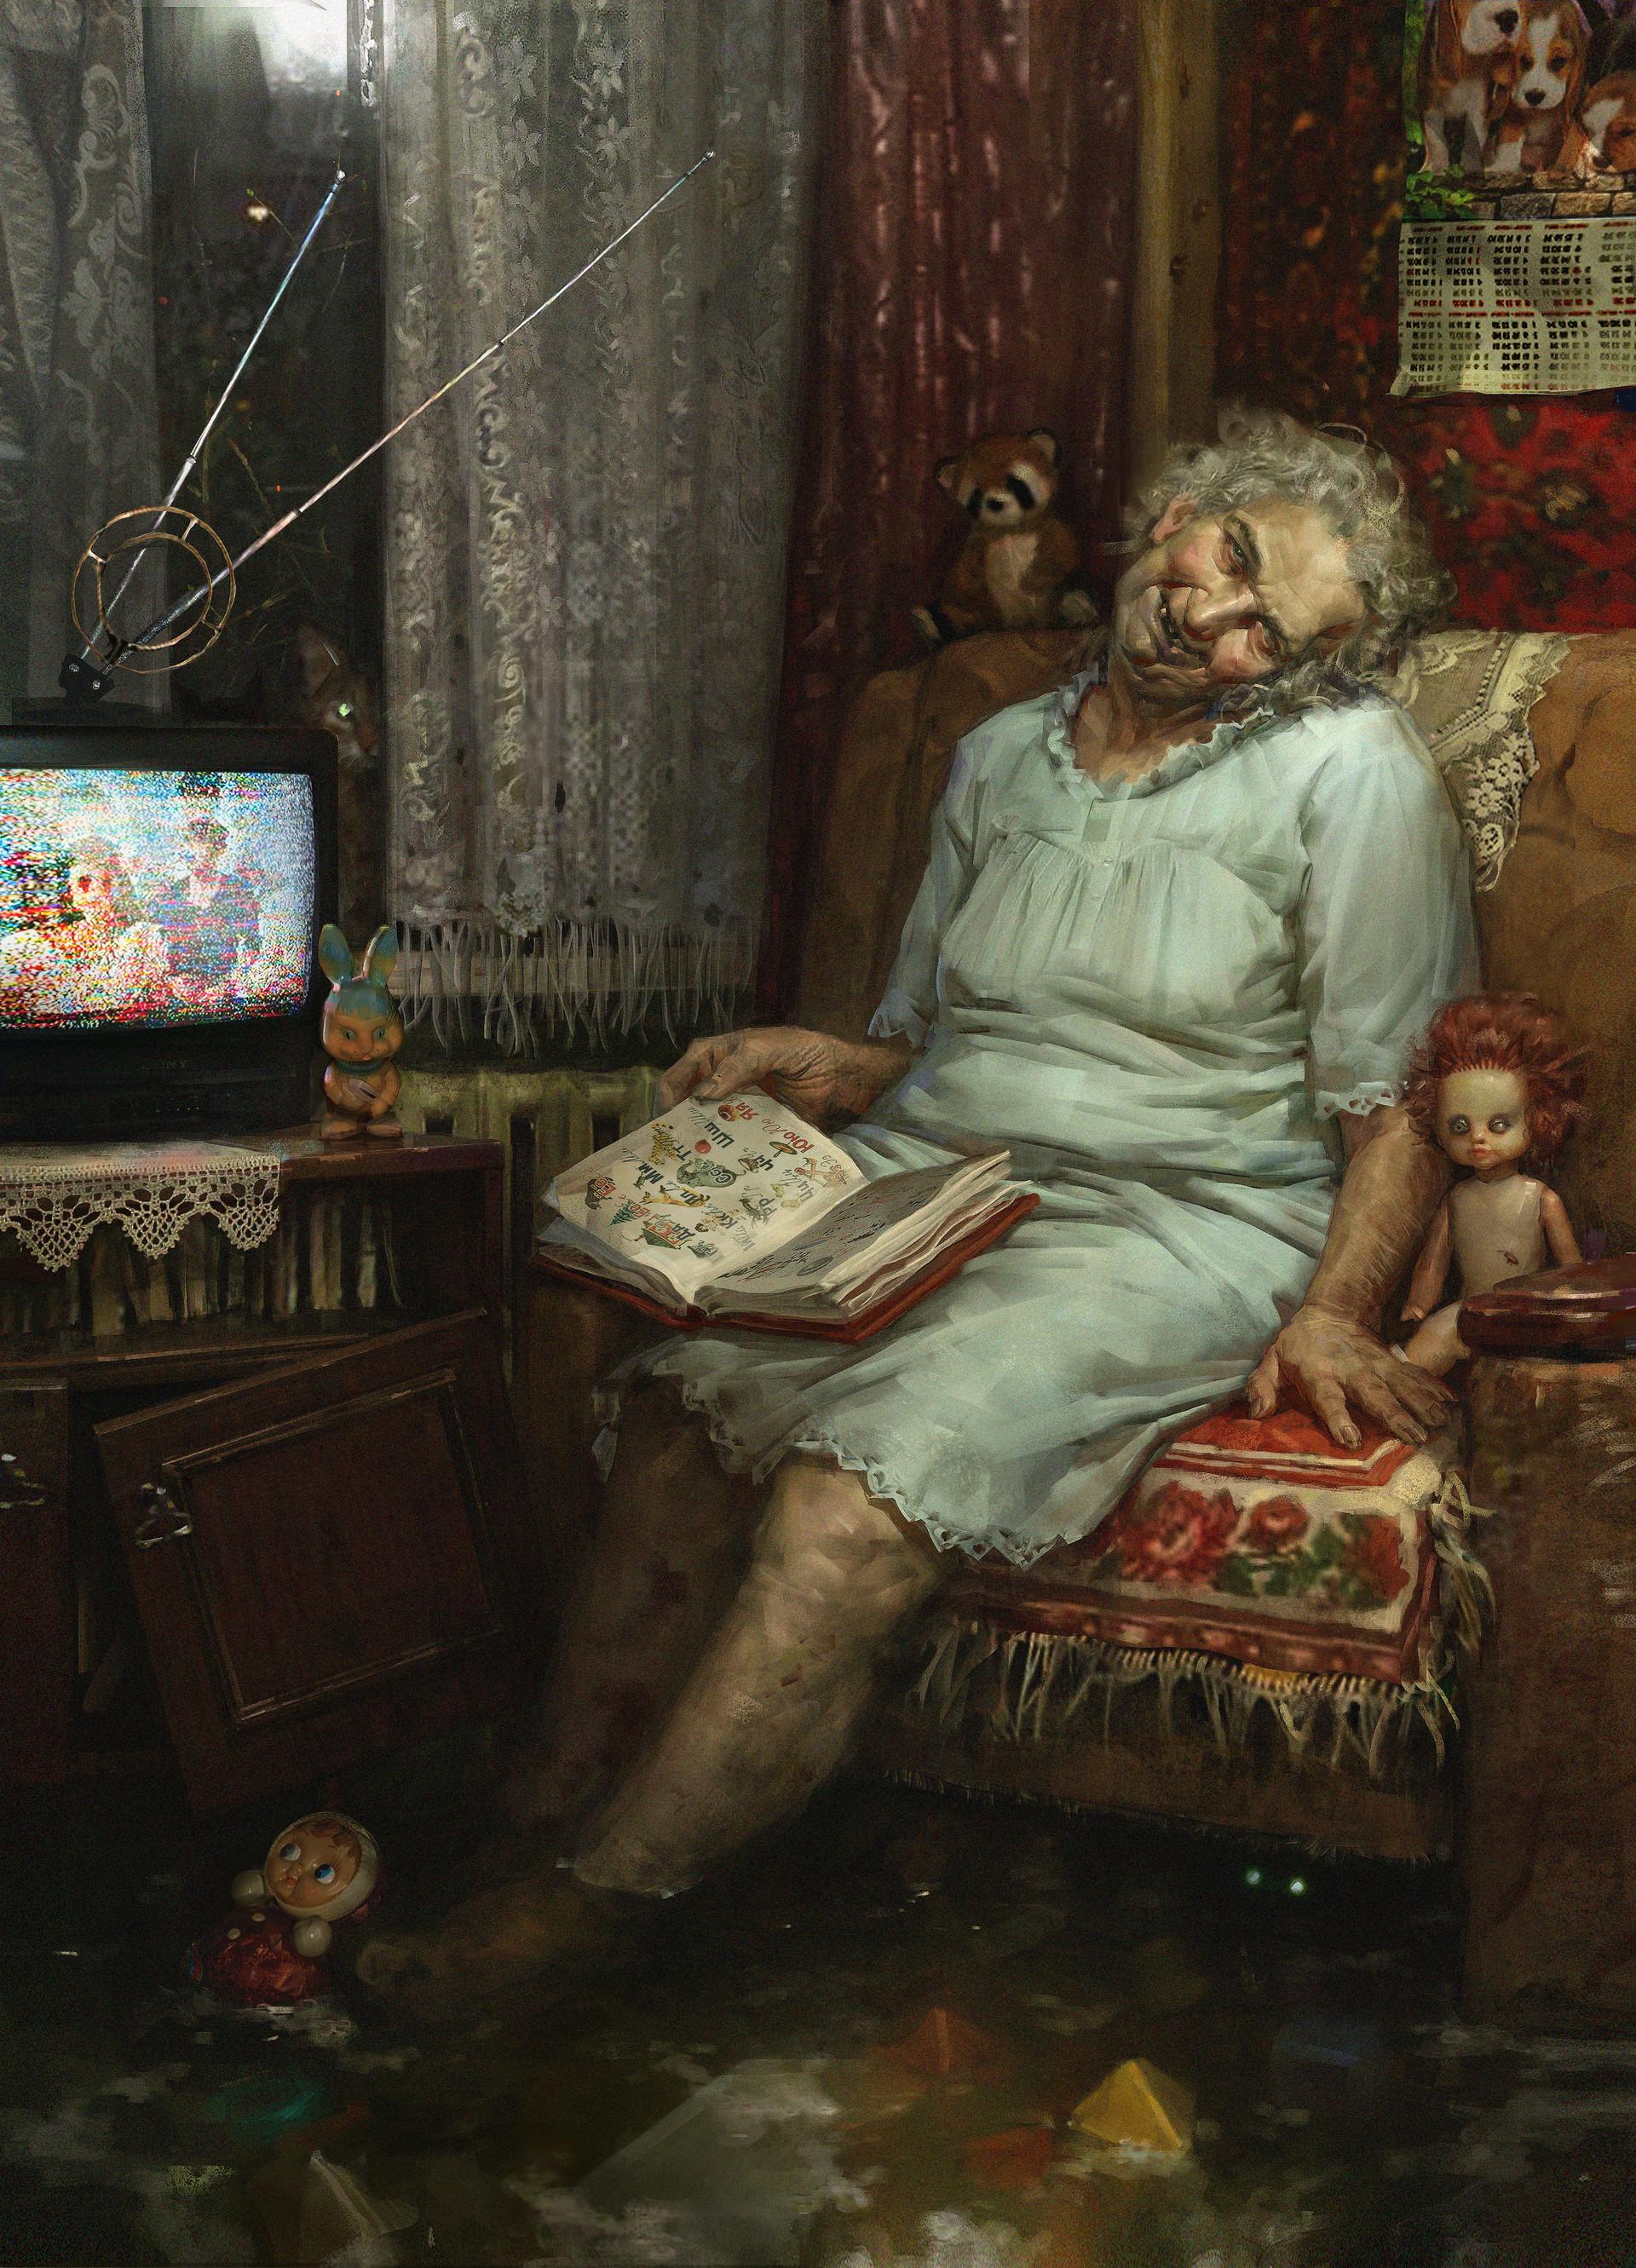 https://cdna.artstation.com/p/assets/images/images/012/316/066/large/yuliya-litvinova-11.jpg